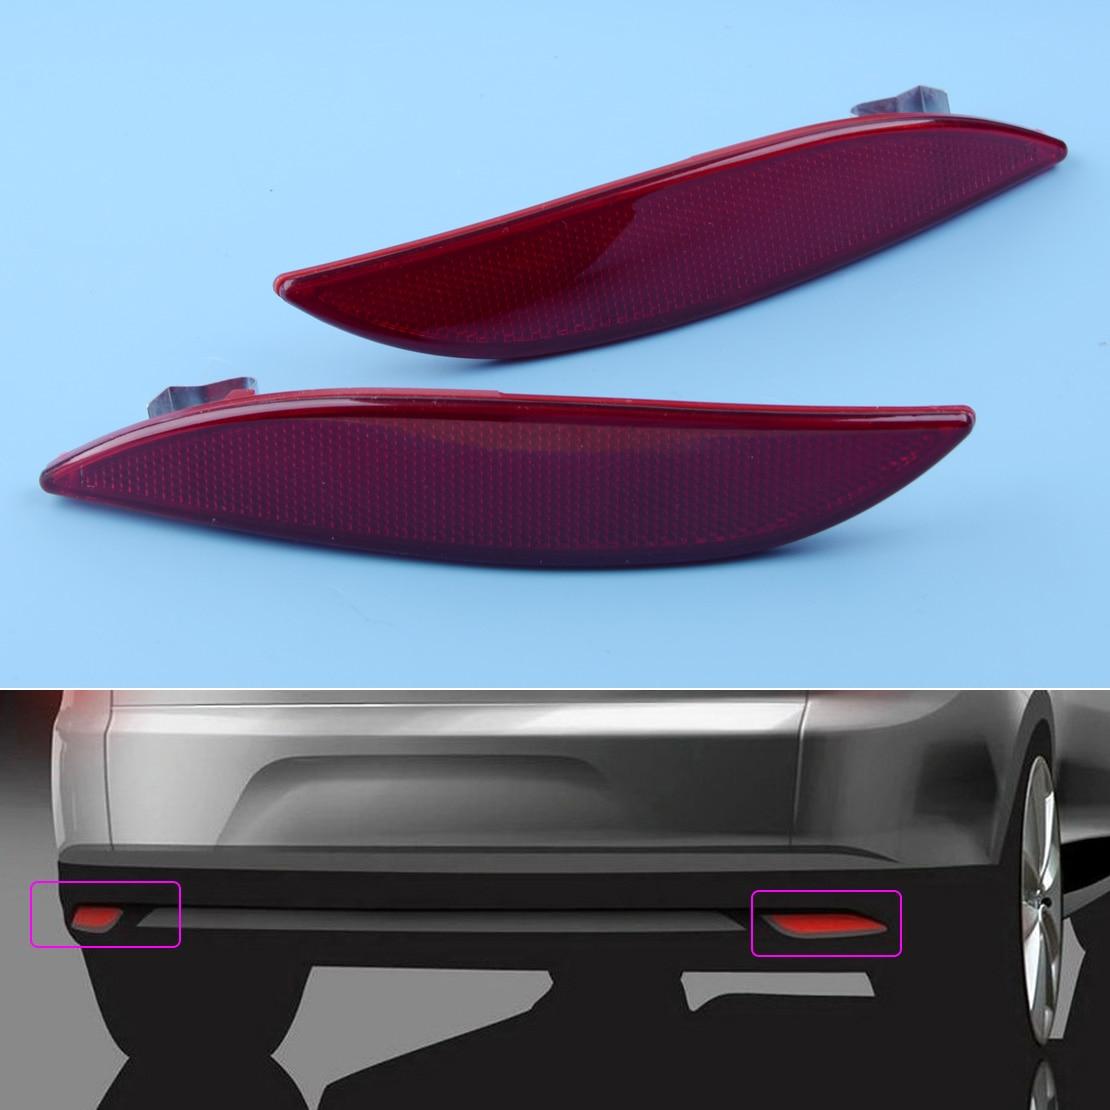 CITALL 2 rojo Reflector de parachoques trasero luz lente 265650004R apto para Renault Megane Clio MK3 2008, 2009, 2010, 2011, 2012, 2013